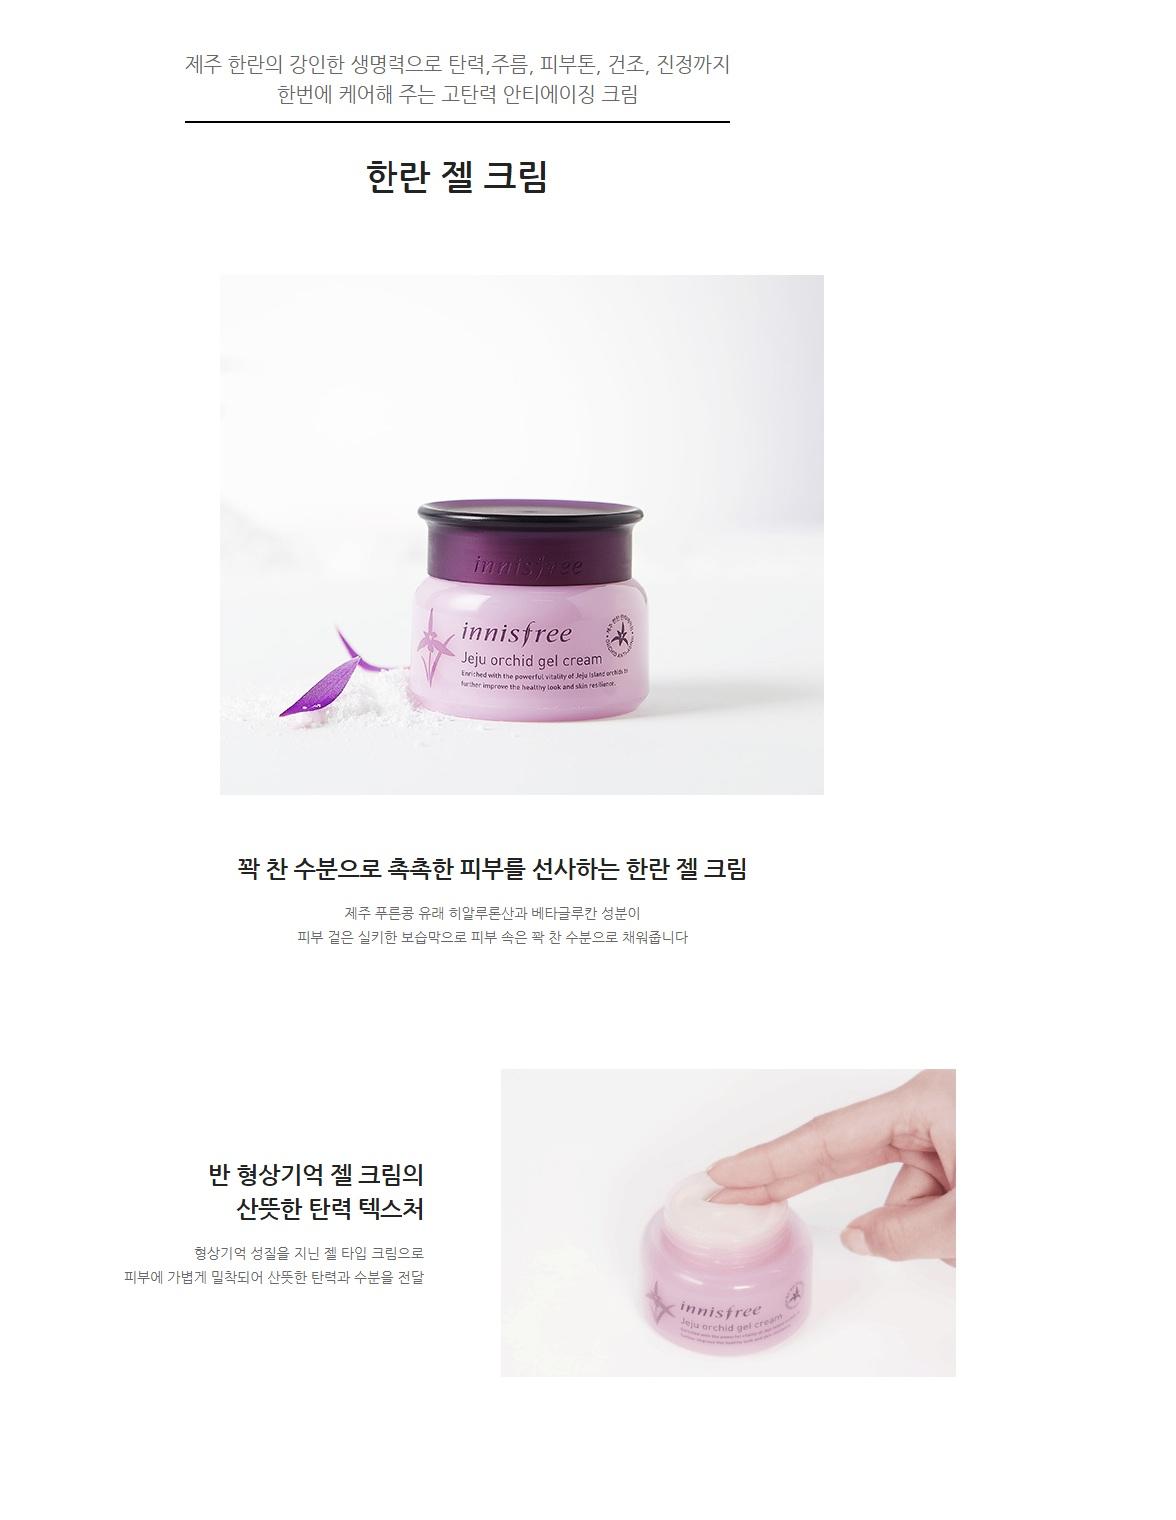 Innisfree Jeju Orchid Gel Cream Best Korean Skincare Product Malaysia Sleeping Pack 80ml Cosmetic Online Shop Macau China1